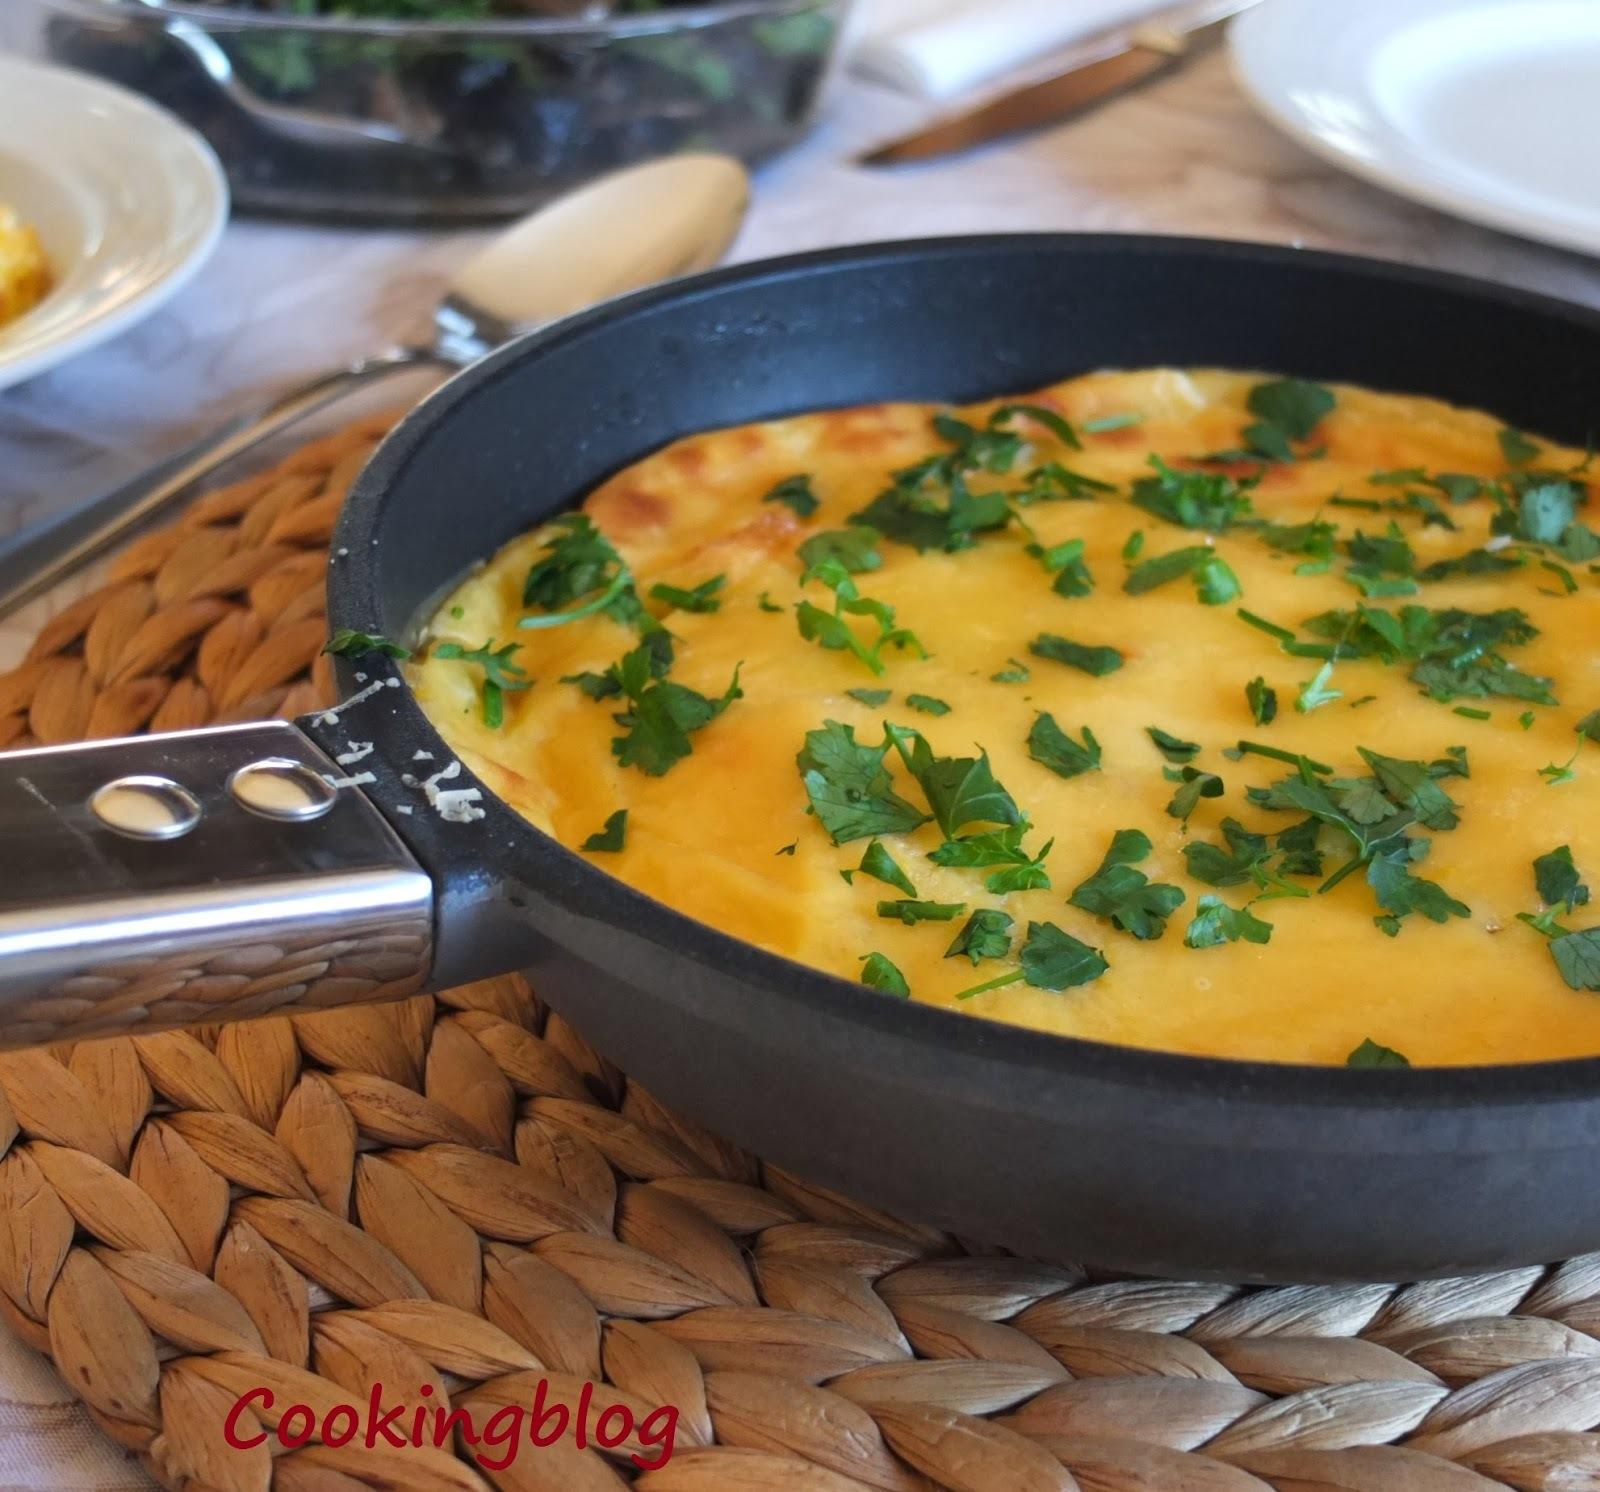 Clássicos da cozinha: omelete Arnold Bennett | Culinary classics: Arnold Bennett omelette